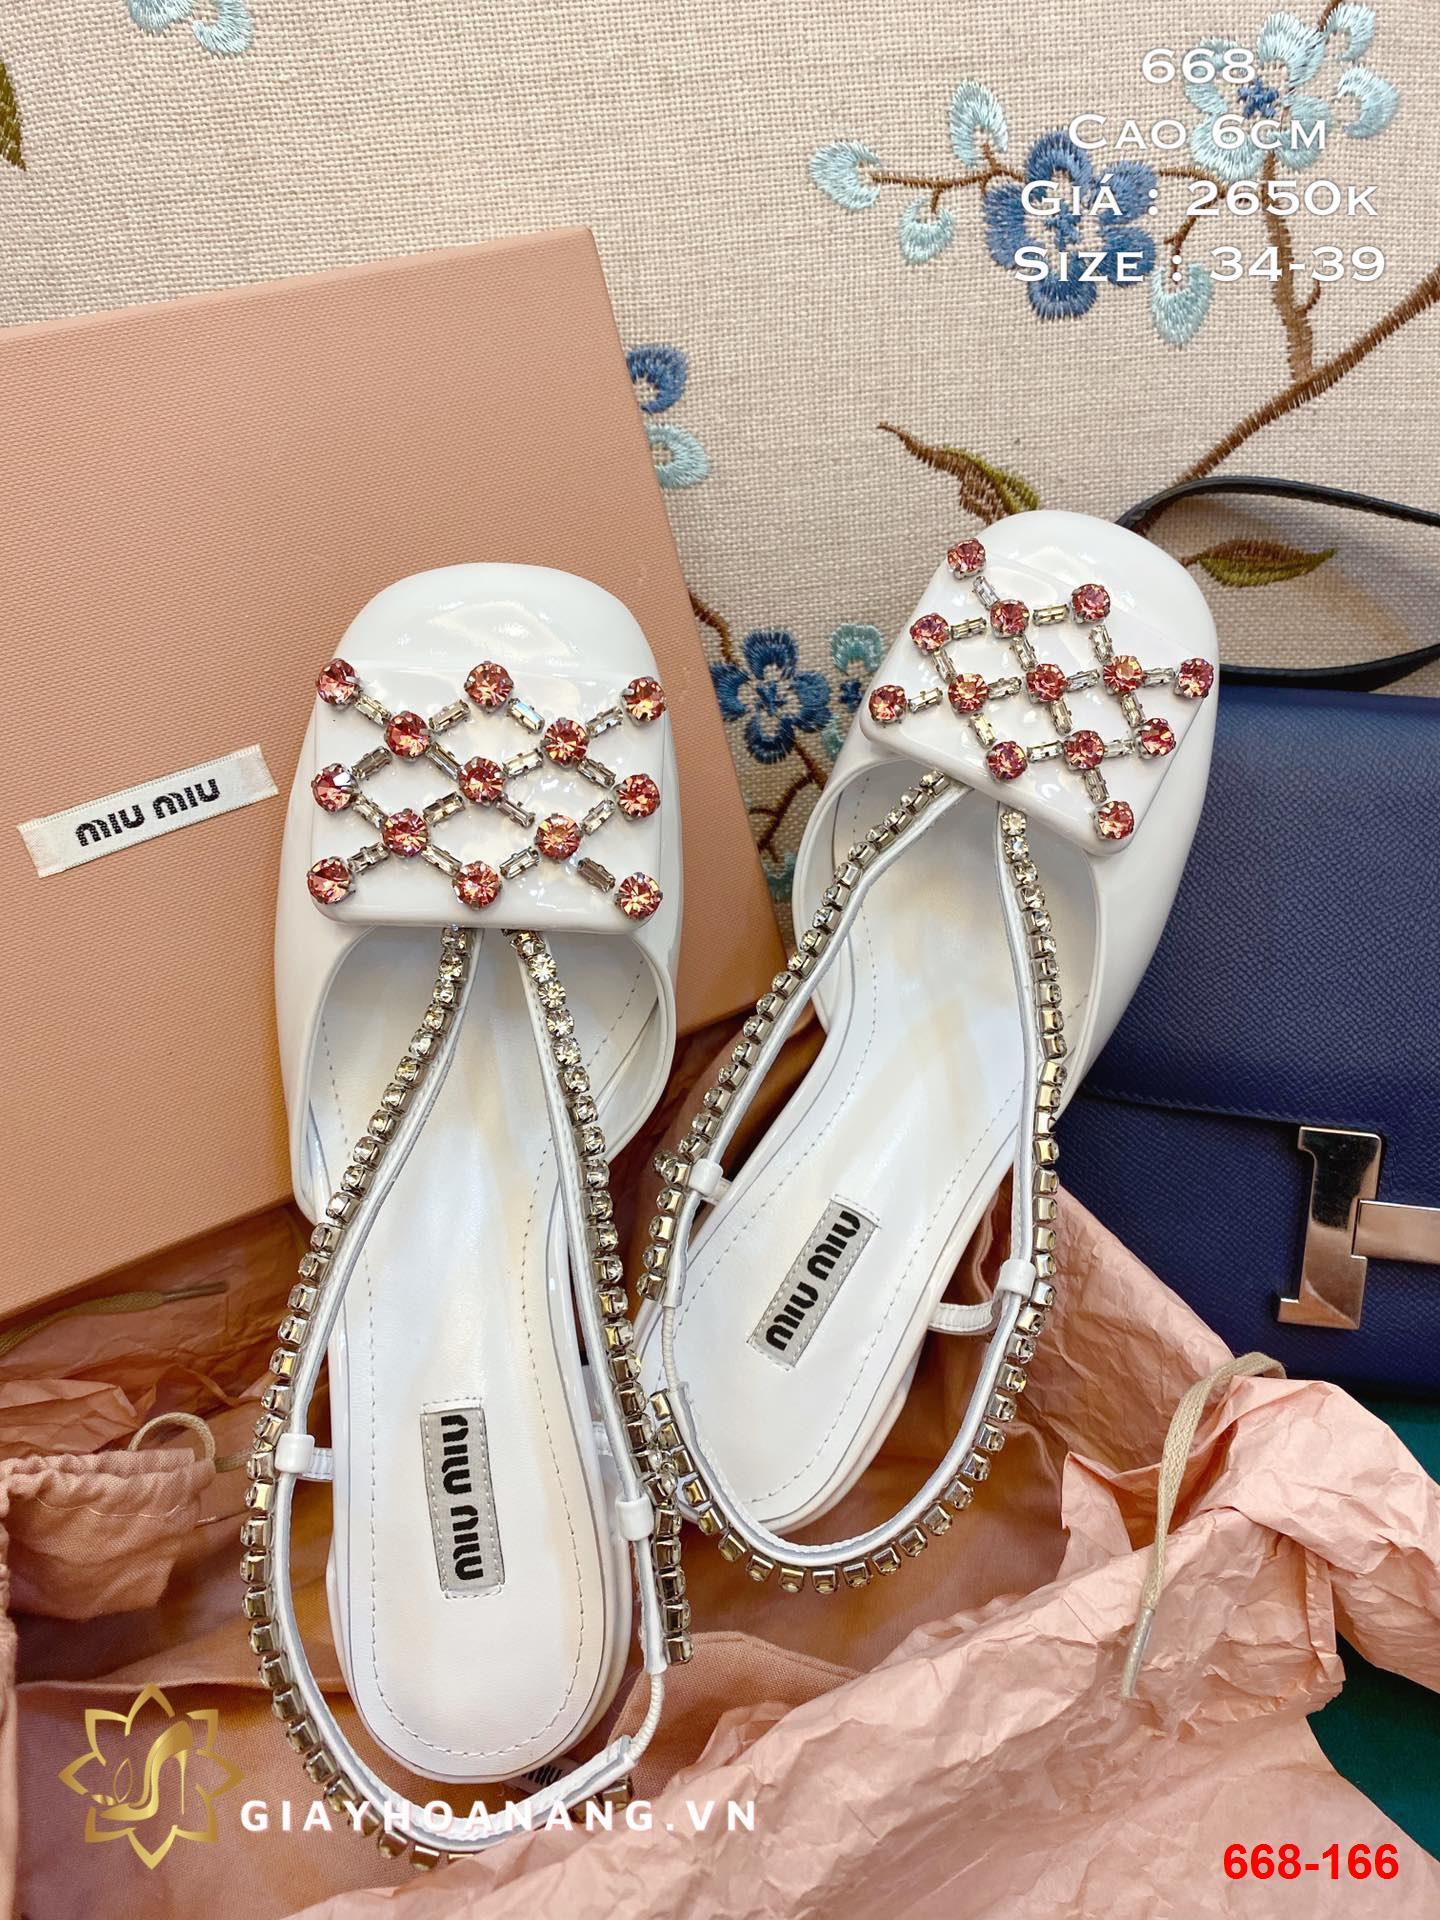 668-166 Miu miu sandal cao 6cm siêu cấp